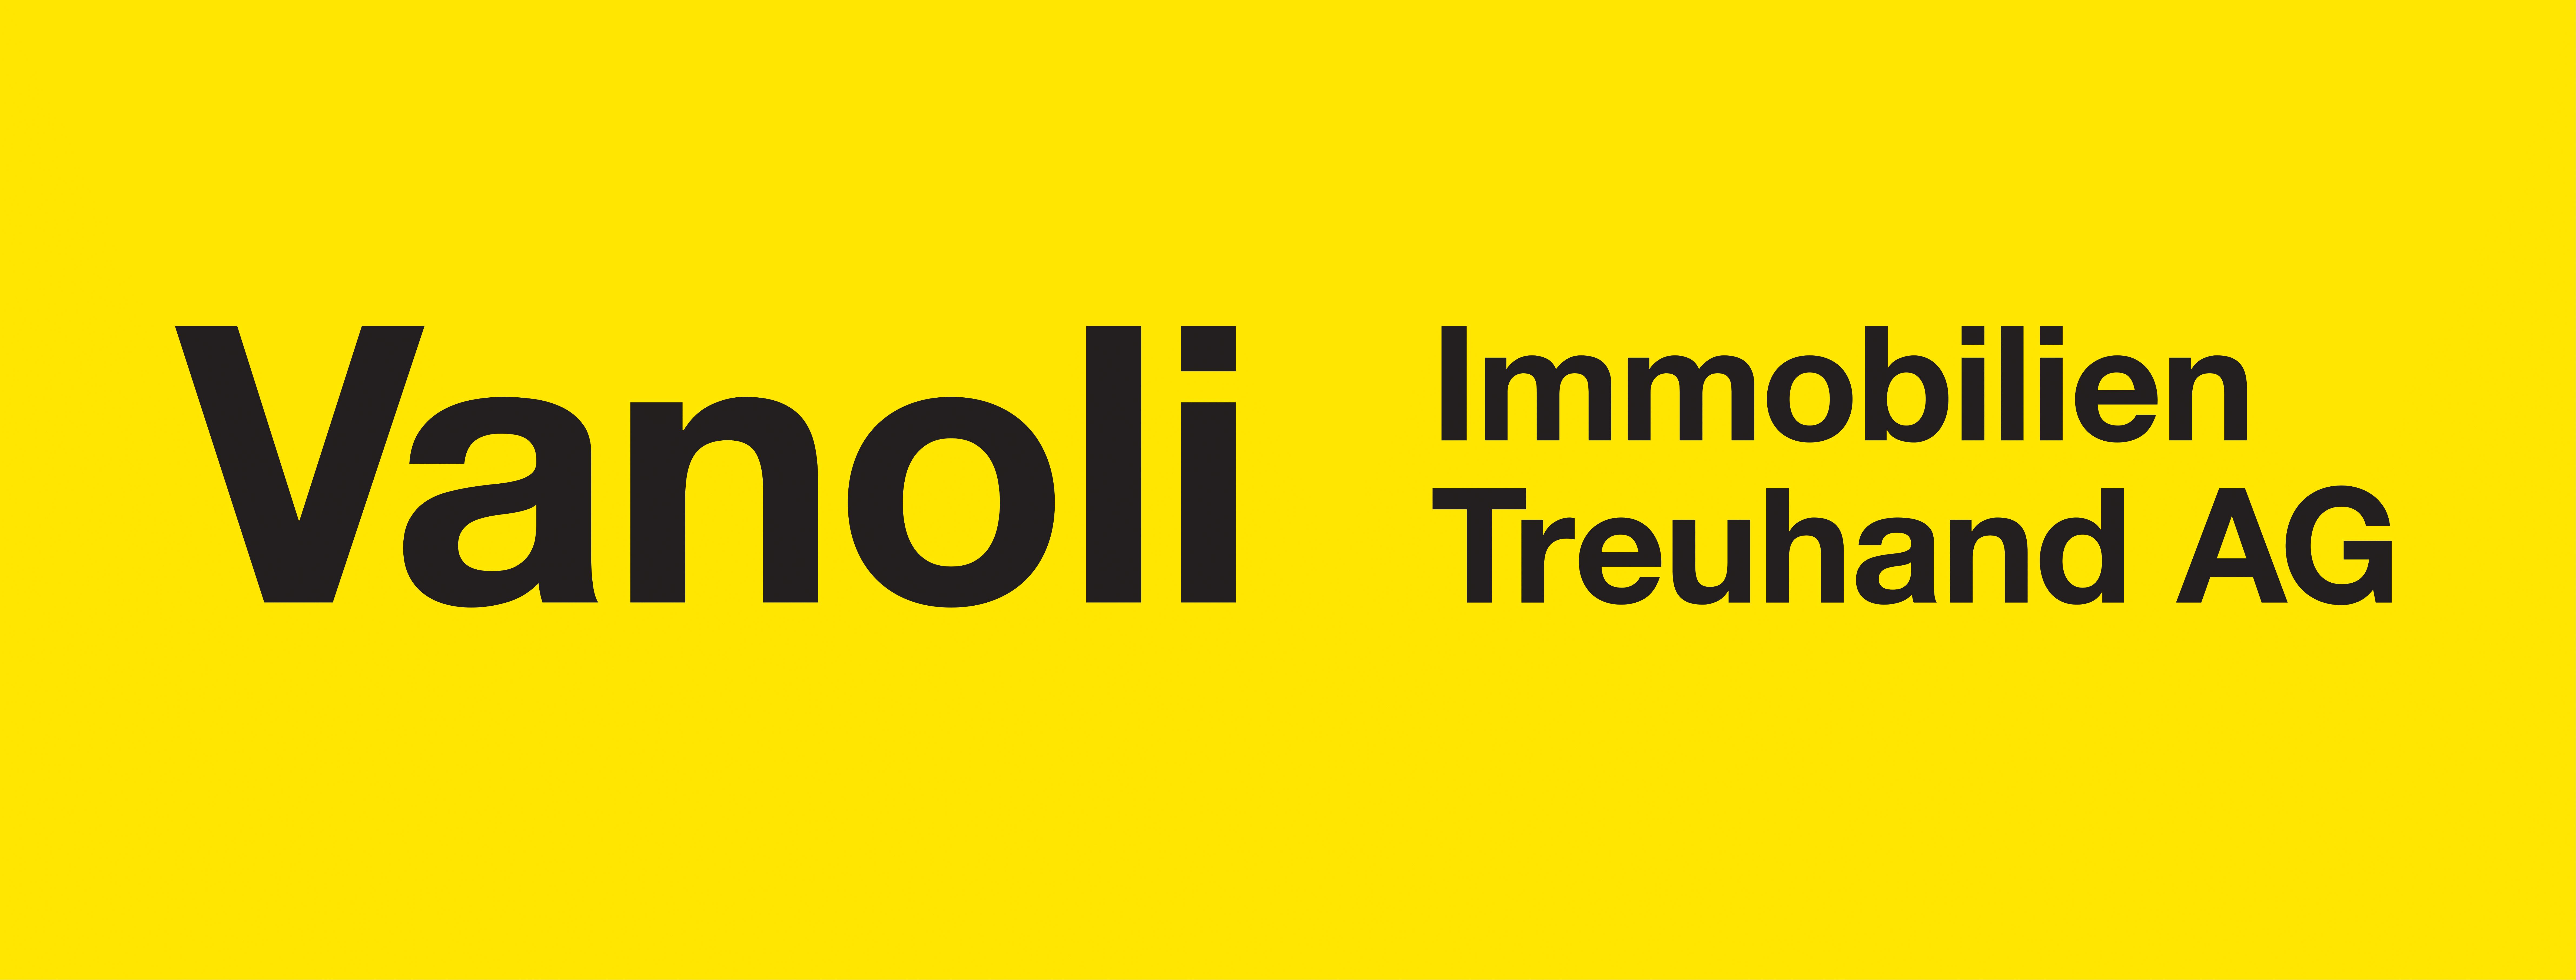 Vanoli